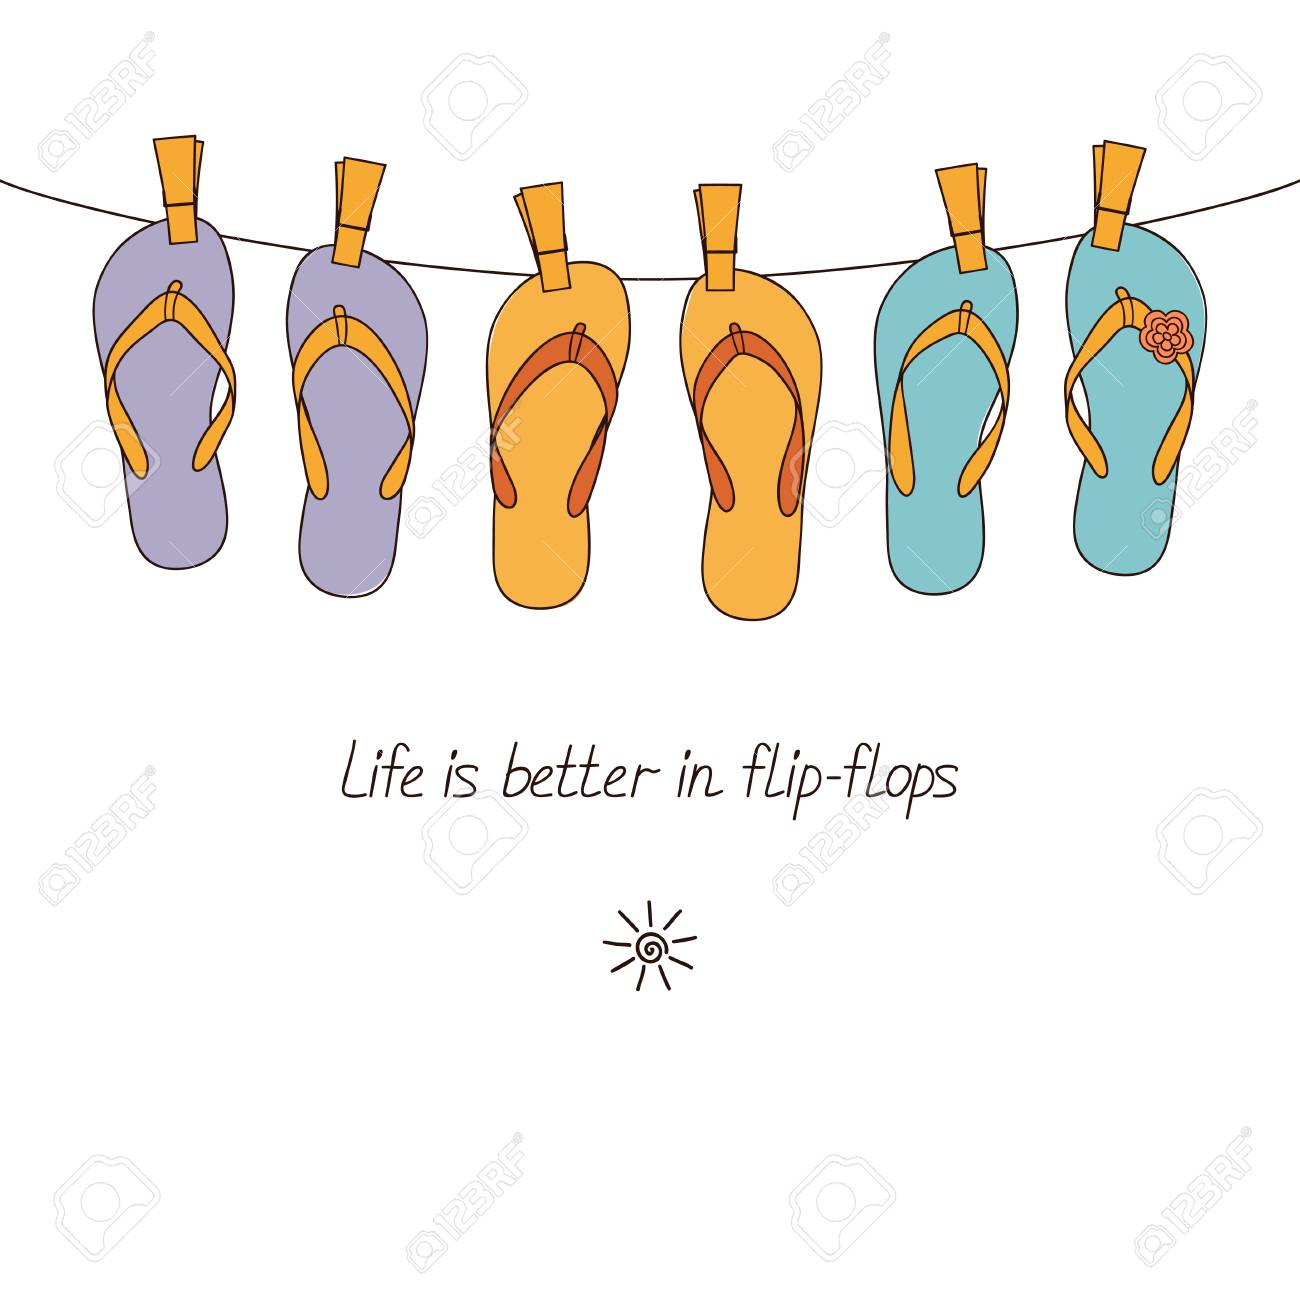 9a8cb4c77813ed Cute flip-flops hanging on clothesline for summertime design Stock Vector -  57232527